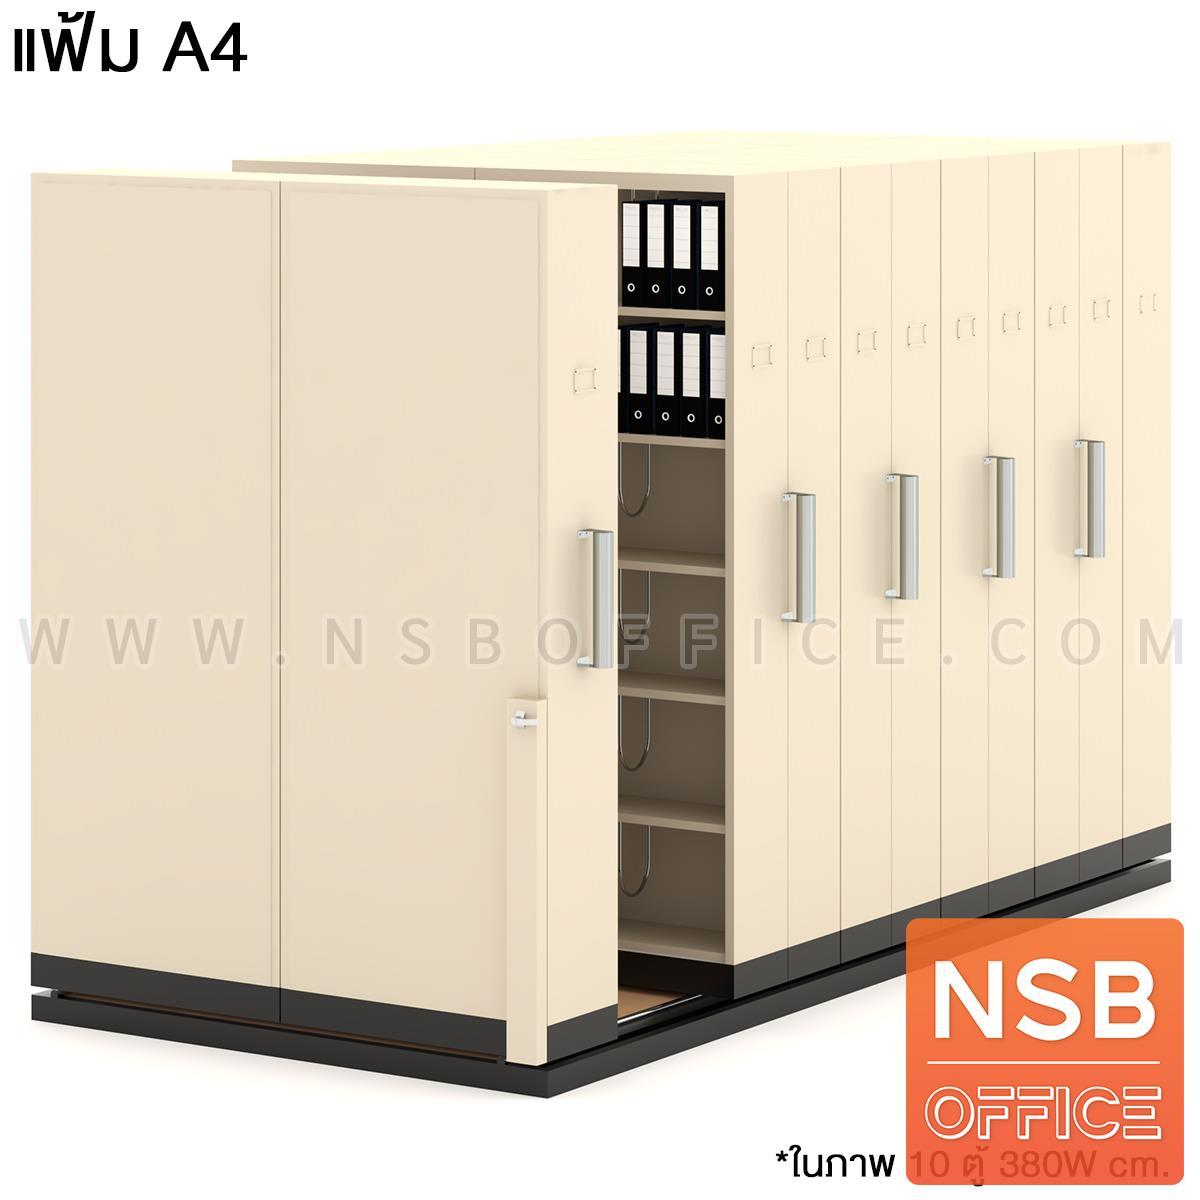 D02A025:ตู้รางเลื่อนแบบมือผลัก 2 ตอน  183D cm ขนาด 6, 8, 10, 12, 14, 16 สำหรับแฟ้ม A4